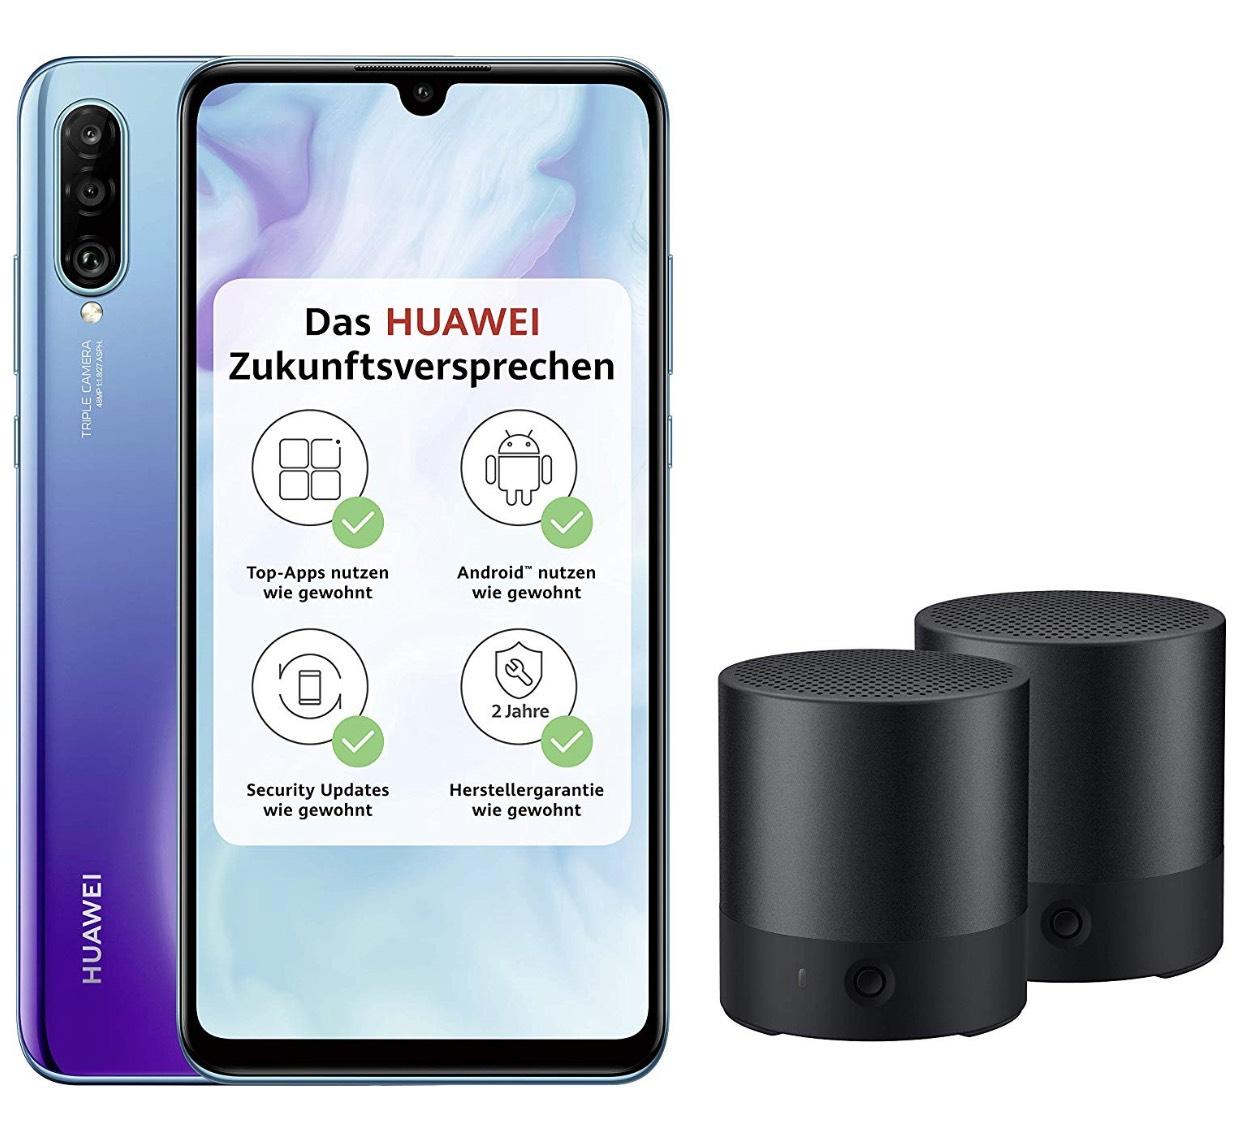 Huawei P30 lite Dual-SIM (6,15 Zoll, 128 GB ROM, 4 GB RAM, Android 9.0) in Schwarz, Weiß oder Peacock Blue + 2 x Bluetooth MiniSpeaker CM510